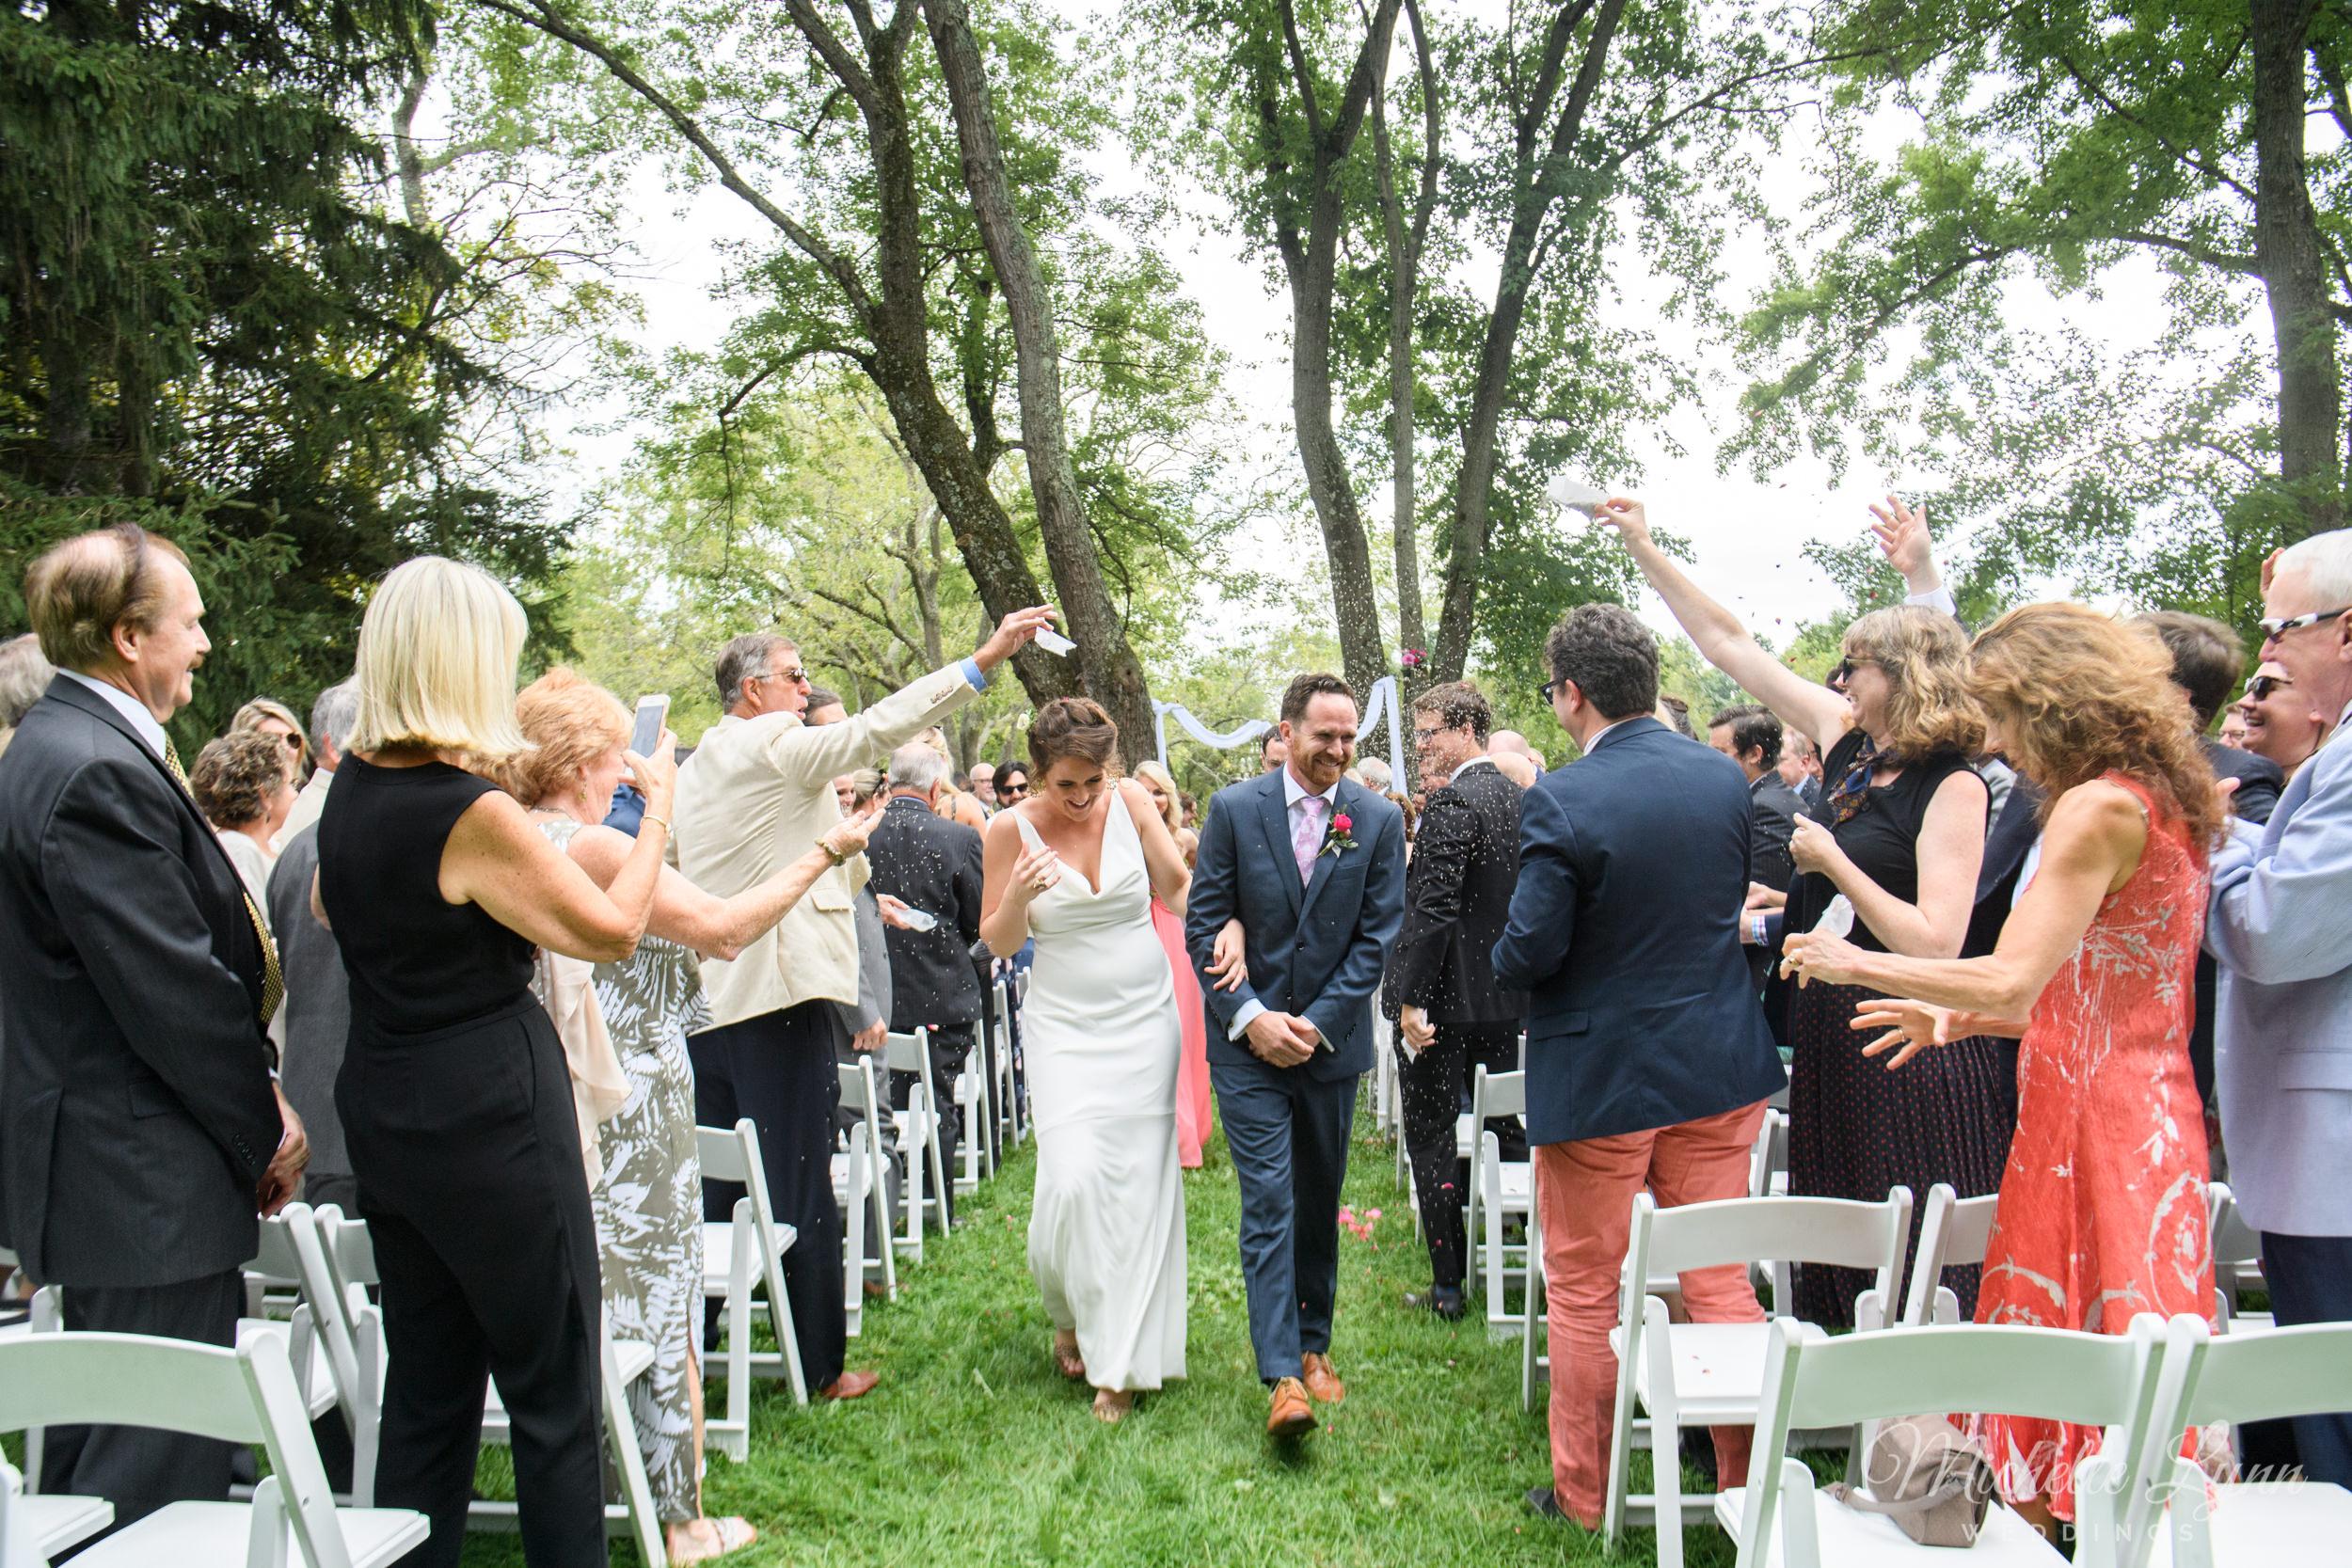 mlw-unionville-vineyards-nj-wedding-photography-47.jpg